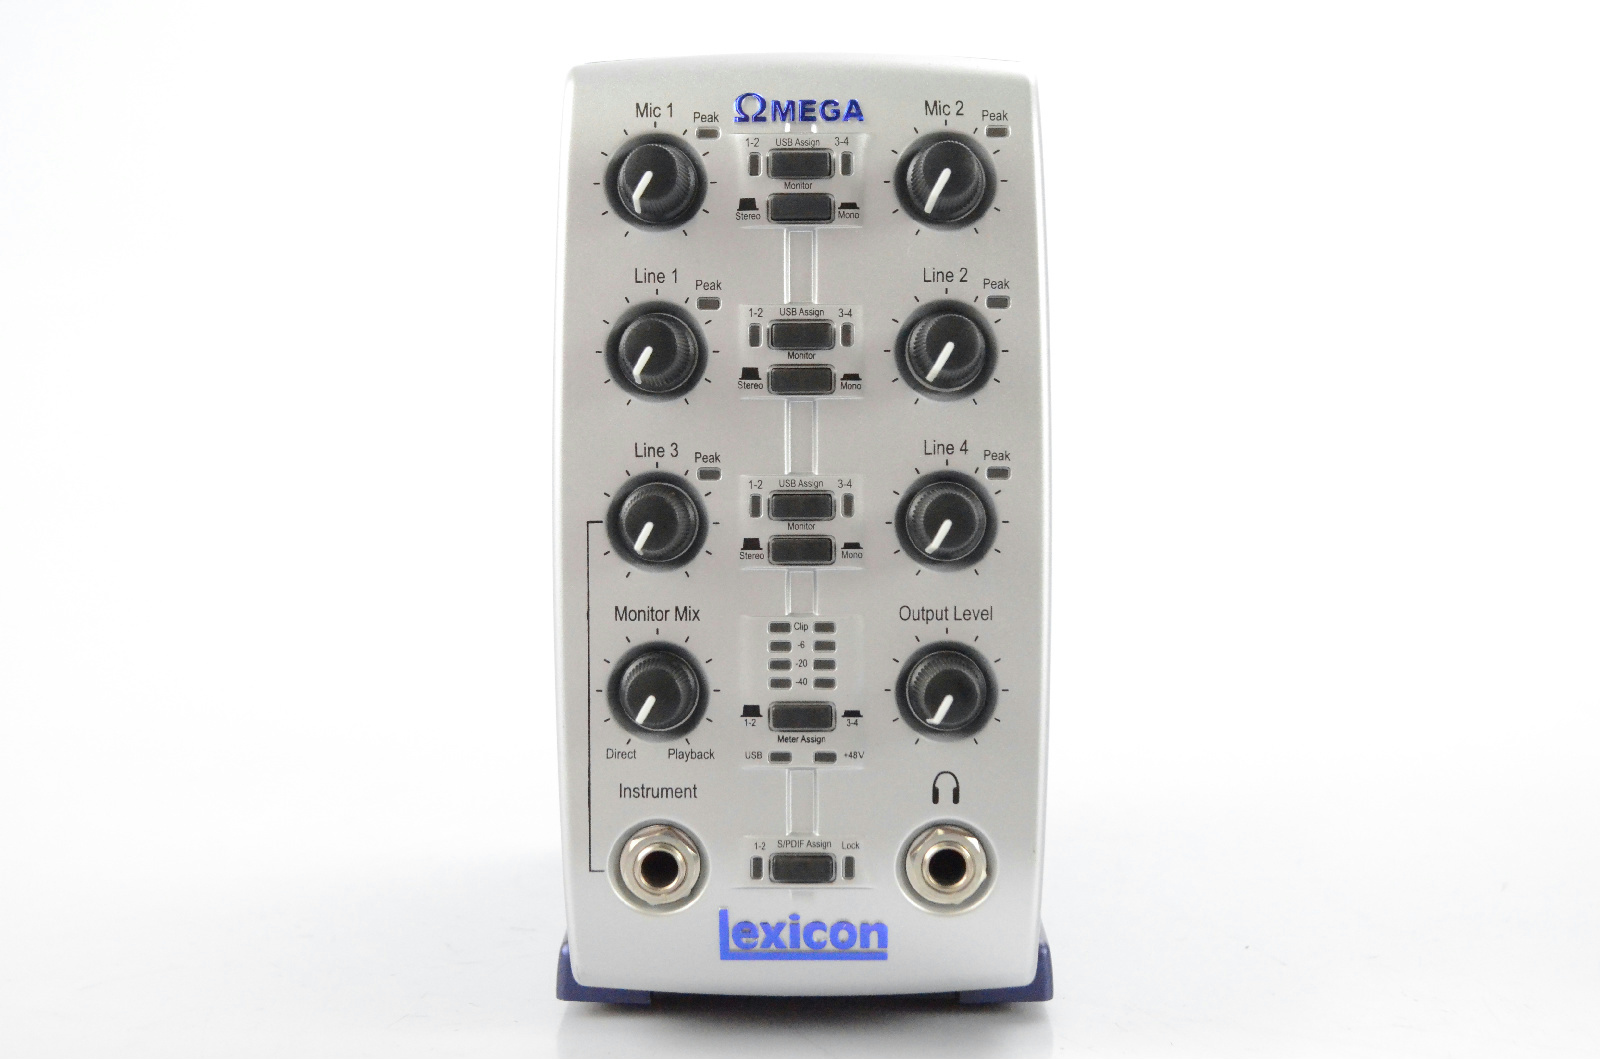 Lexicon Omega Recording USB Audio Interface w/ Box Manuals & Power Supply #32219